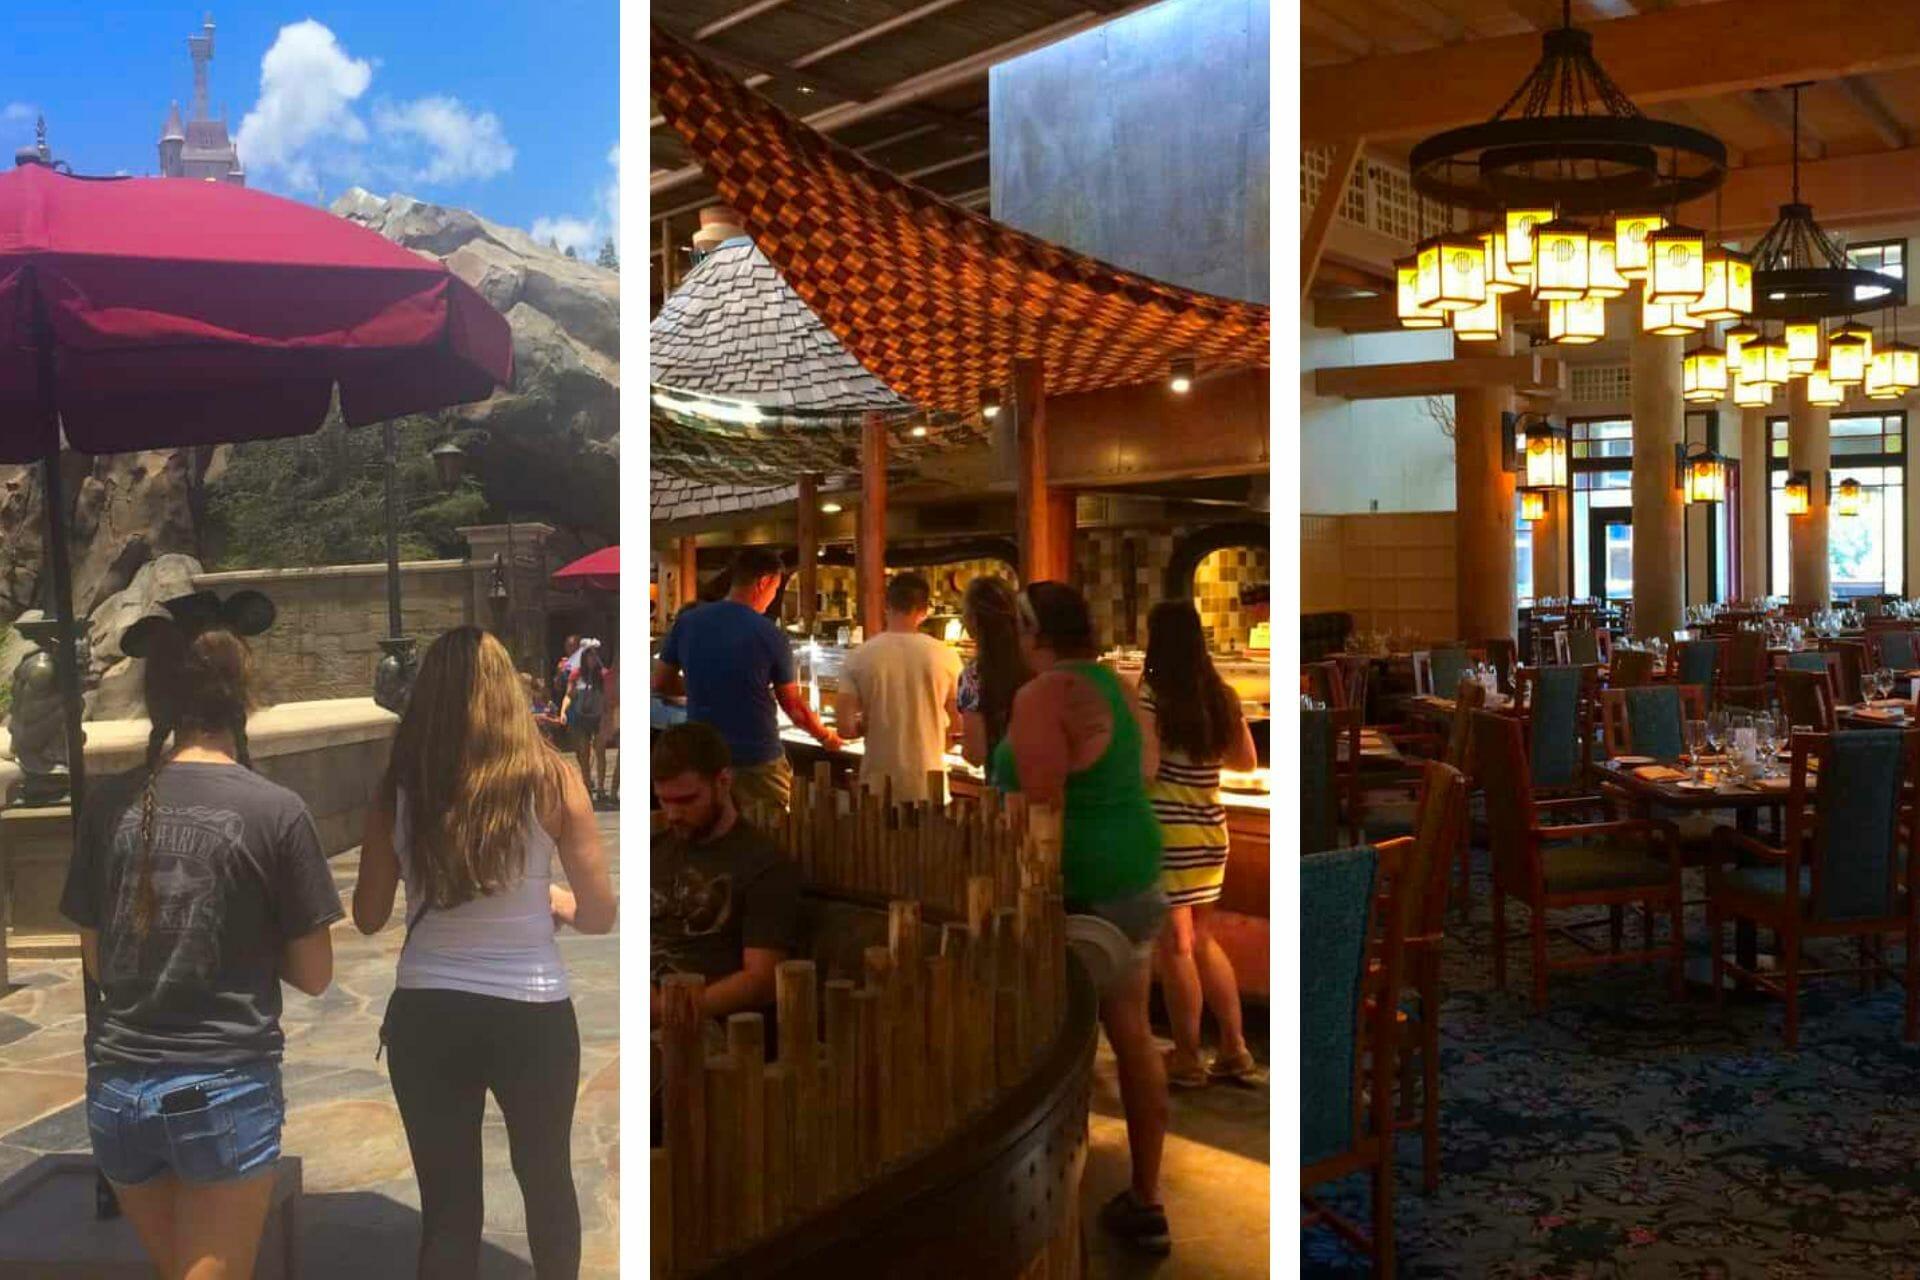 7+ Brilliant Ways to Make Hard to Get Disney Dining Reservations (2021) via @allamericanatlas